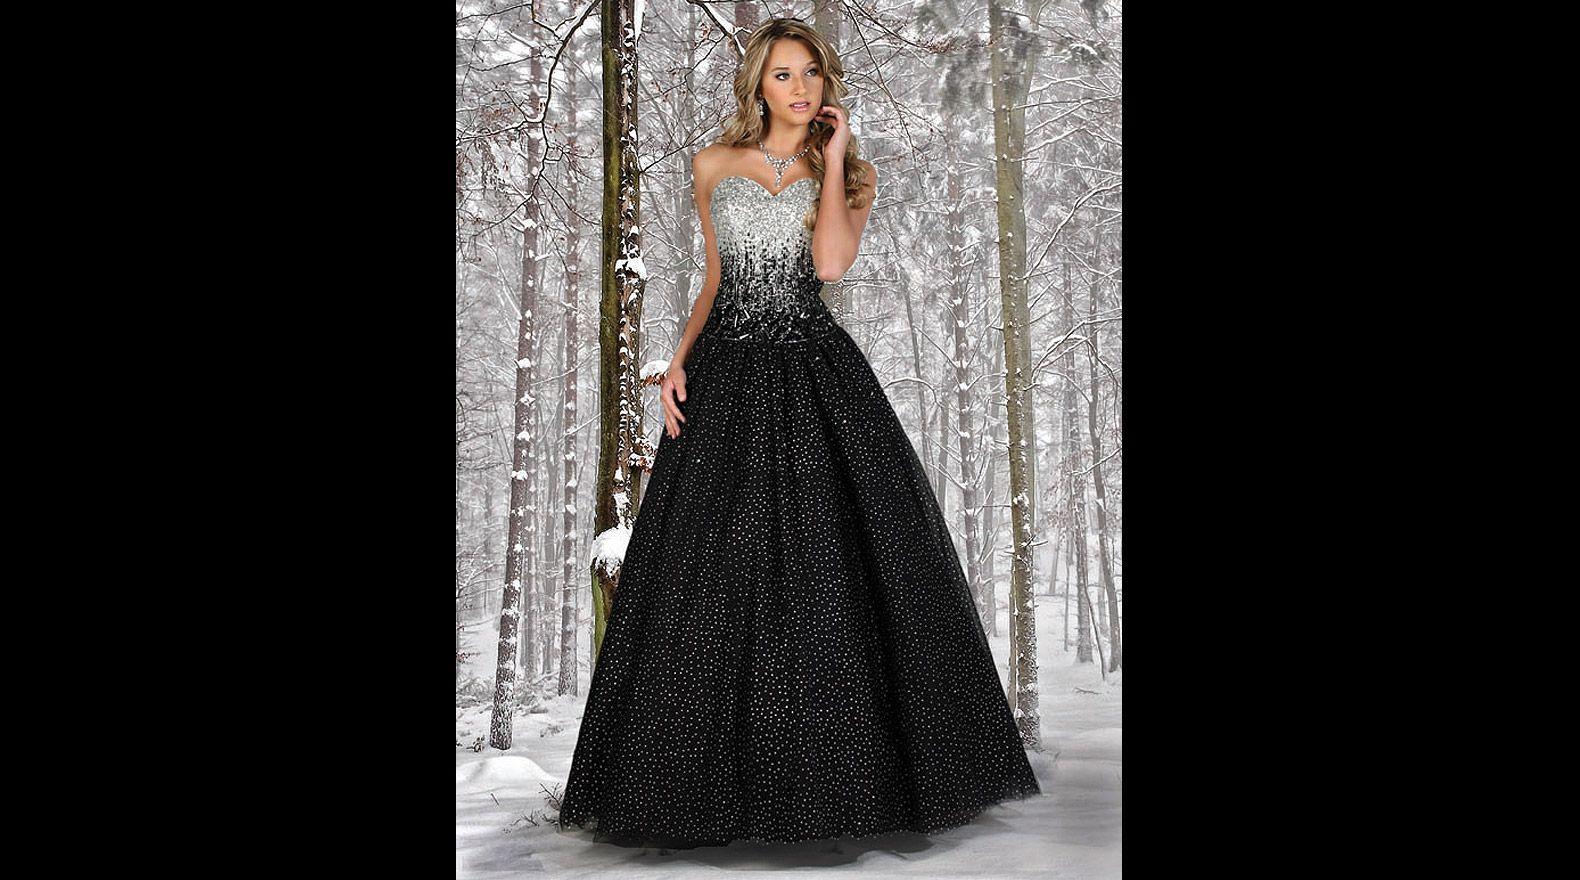 disney inspired prom dresses - Google Search